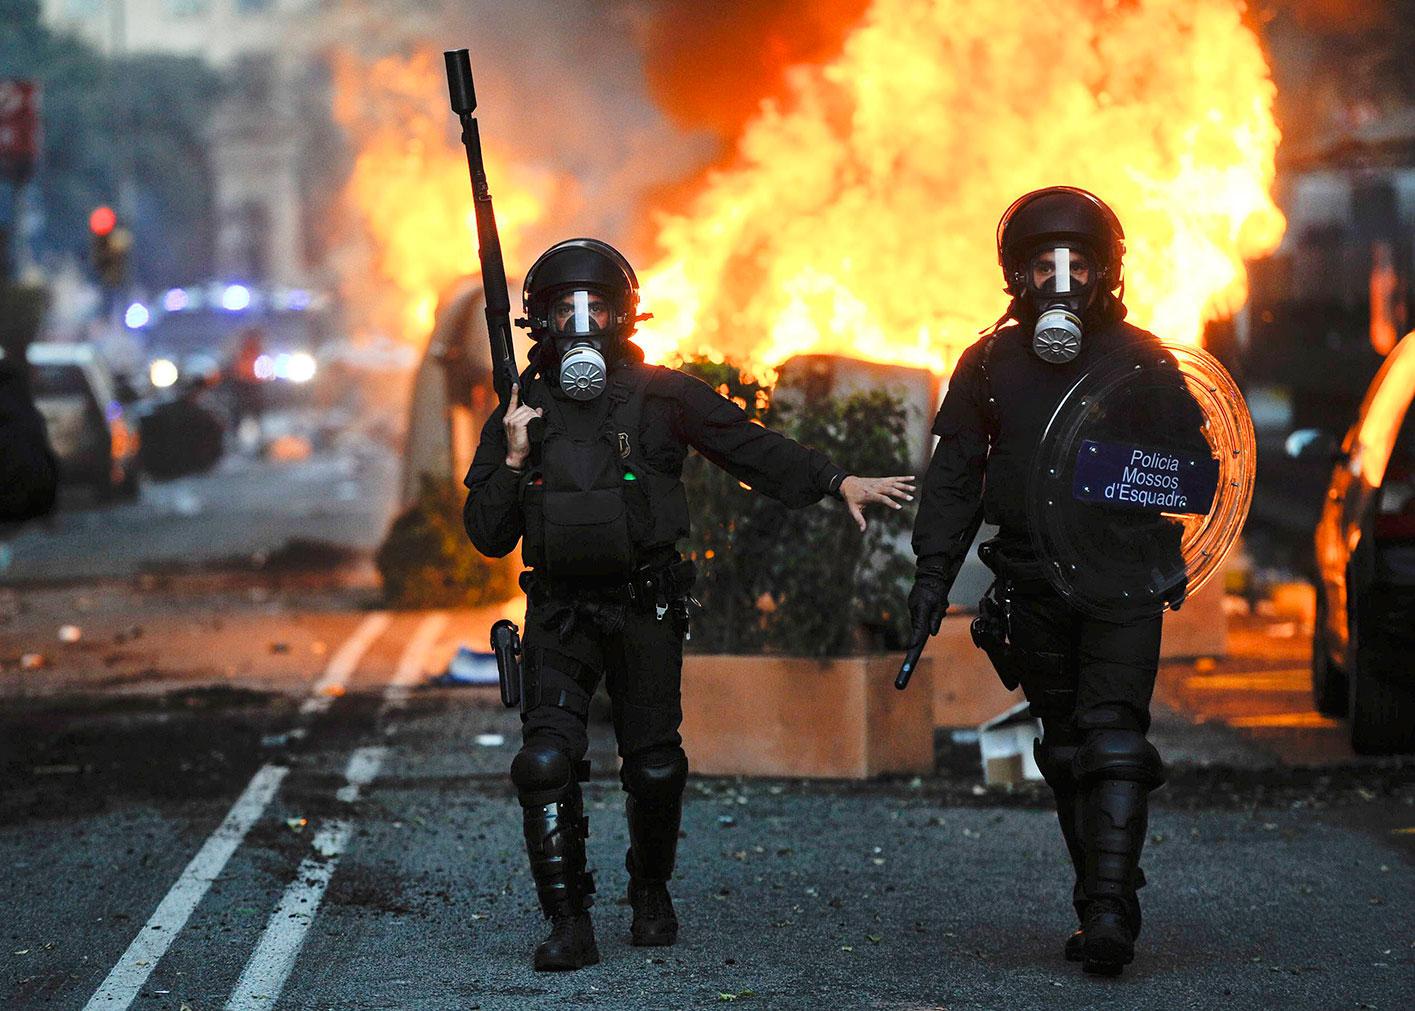 police_riot_March-29-2012_Barcelona_Spain_1500w.jpg